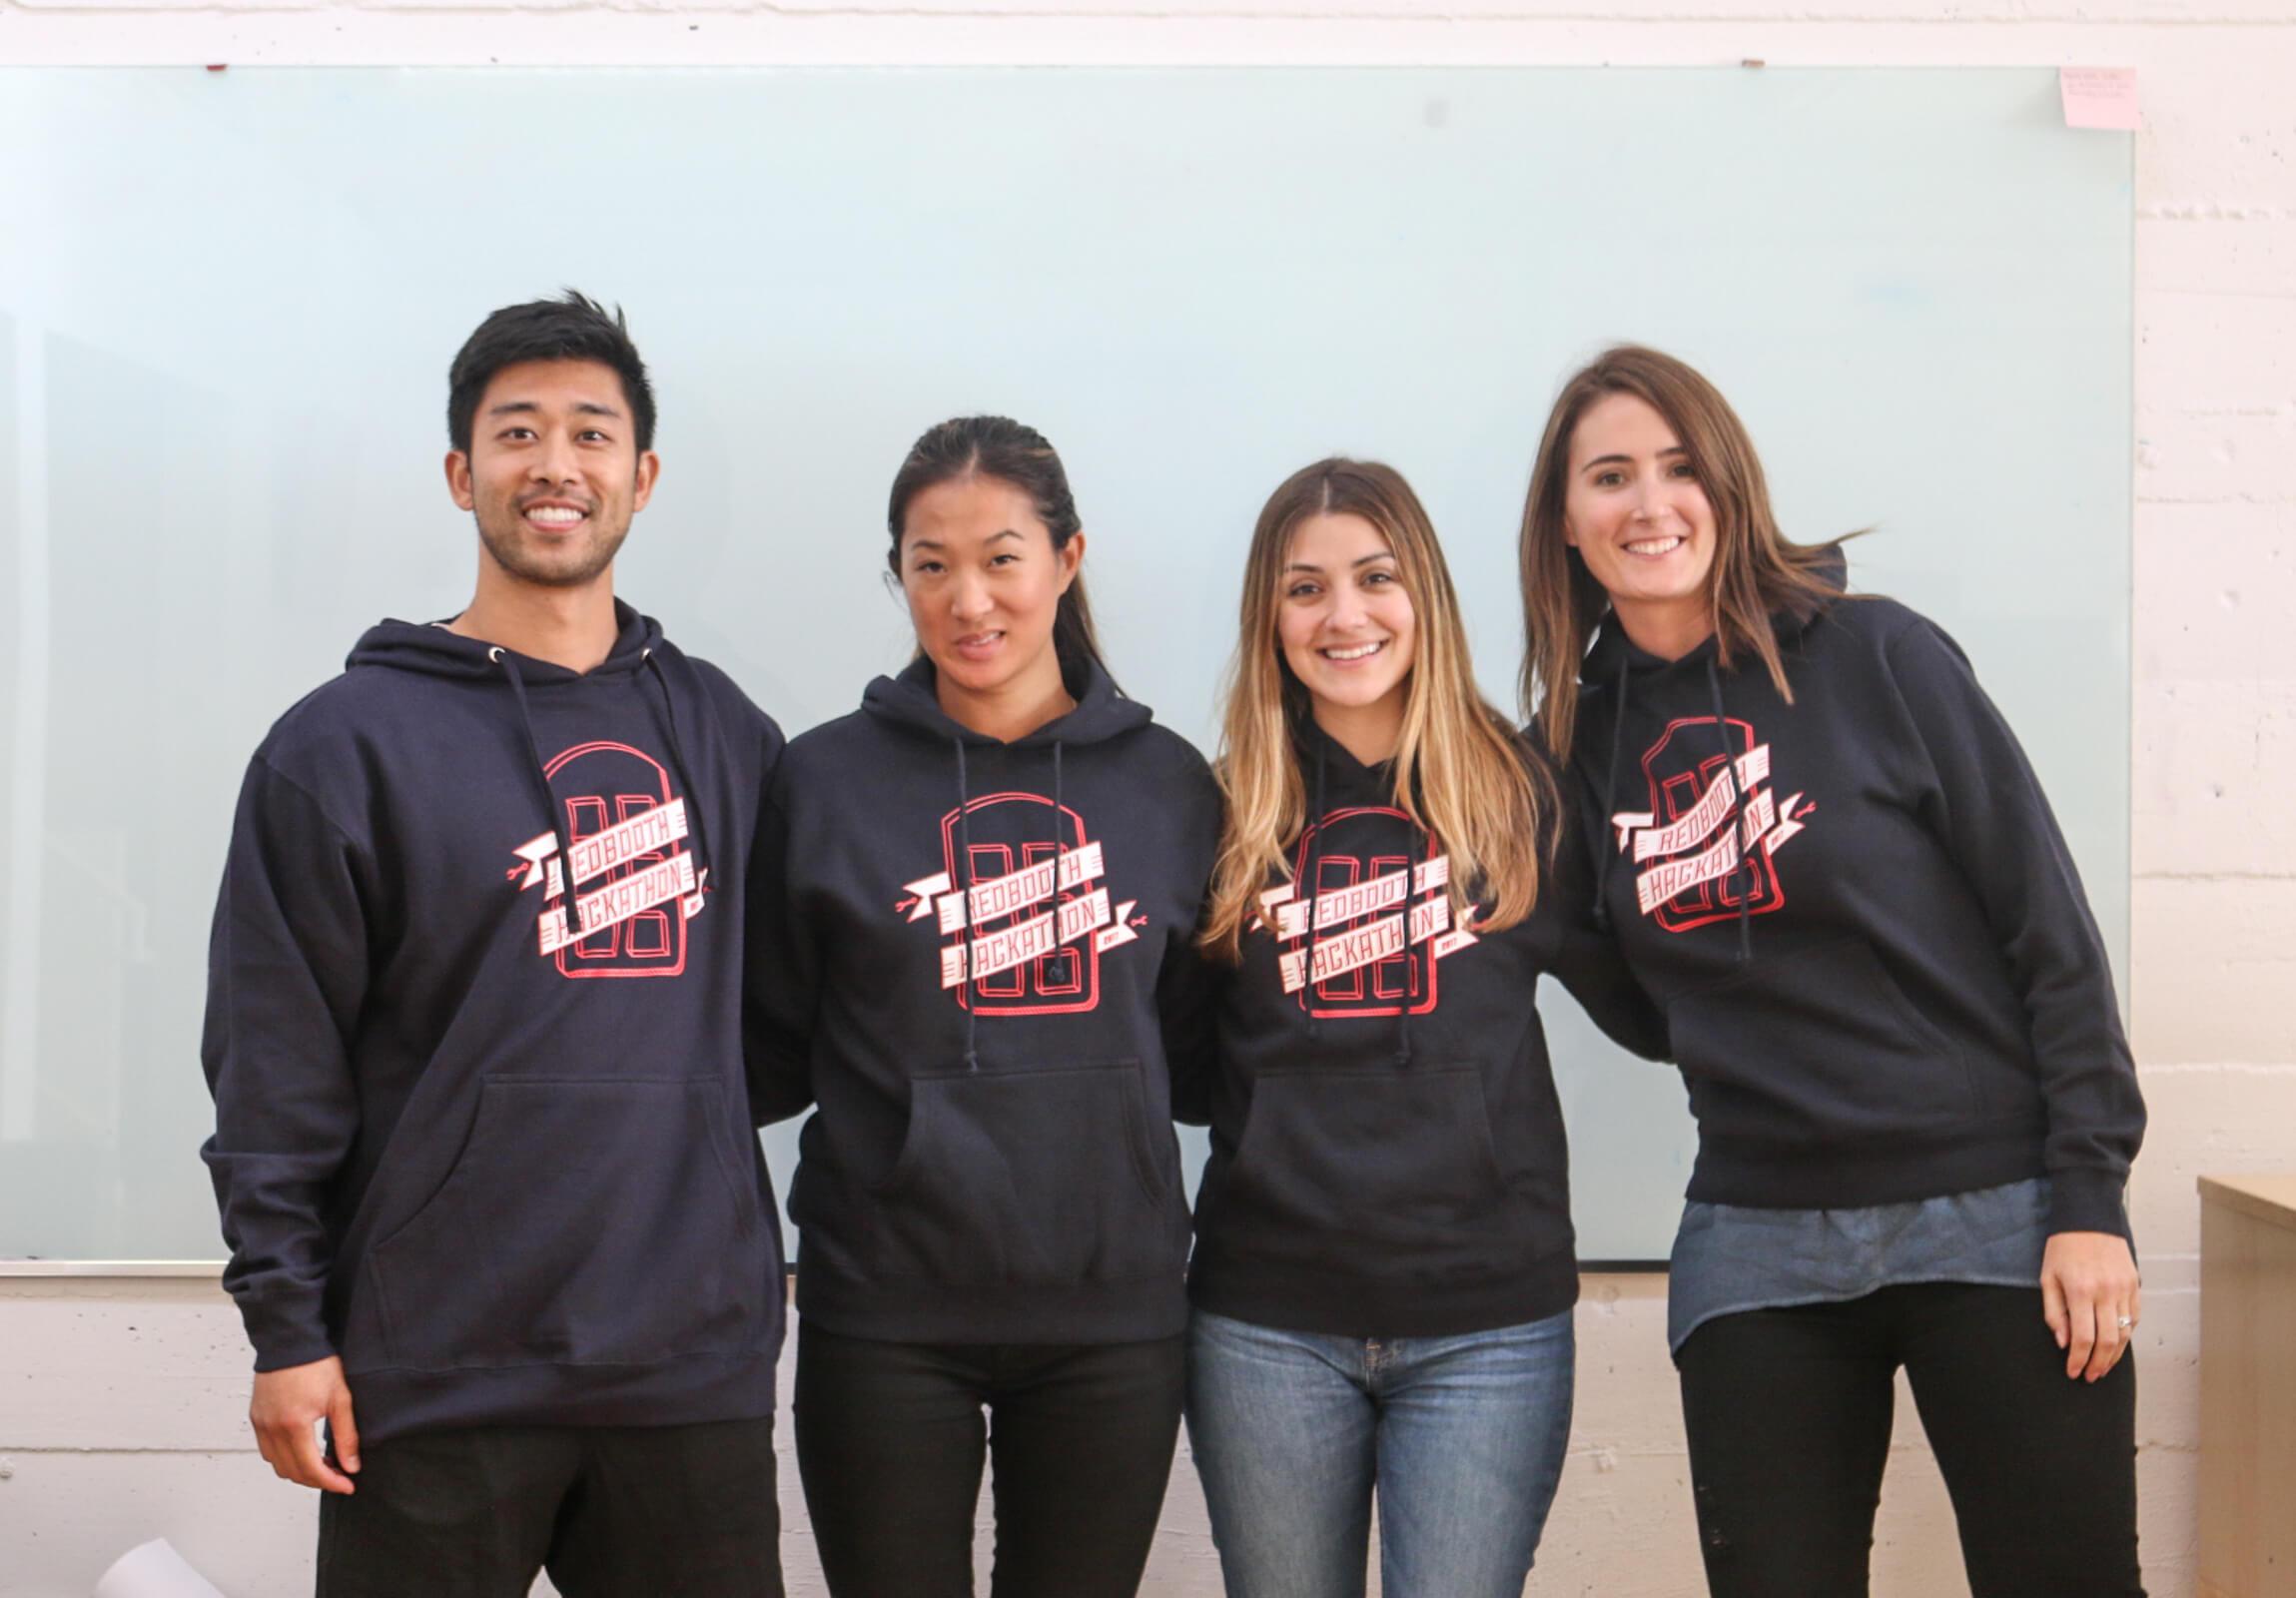 Redbooth hackathon participants pose with hoodies